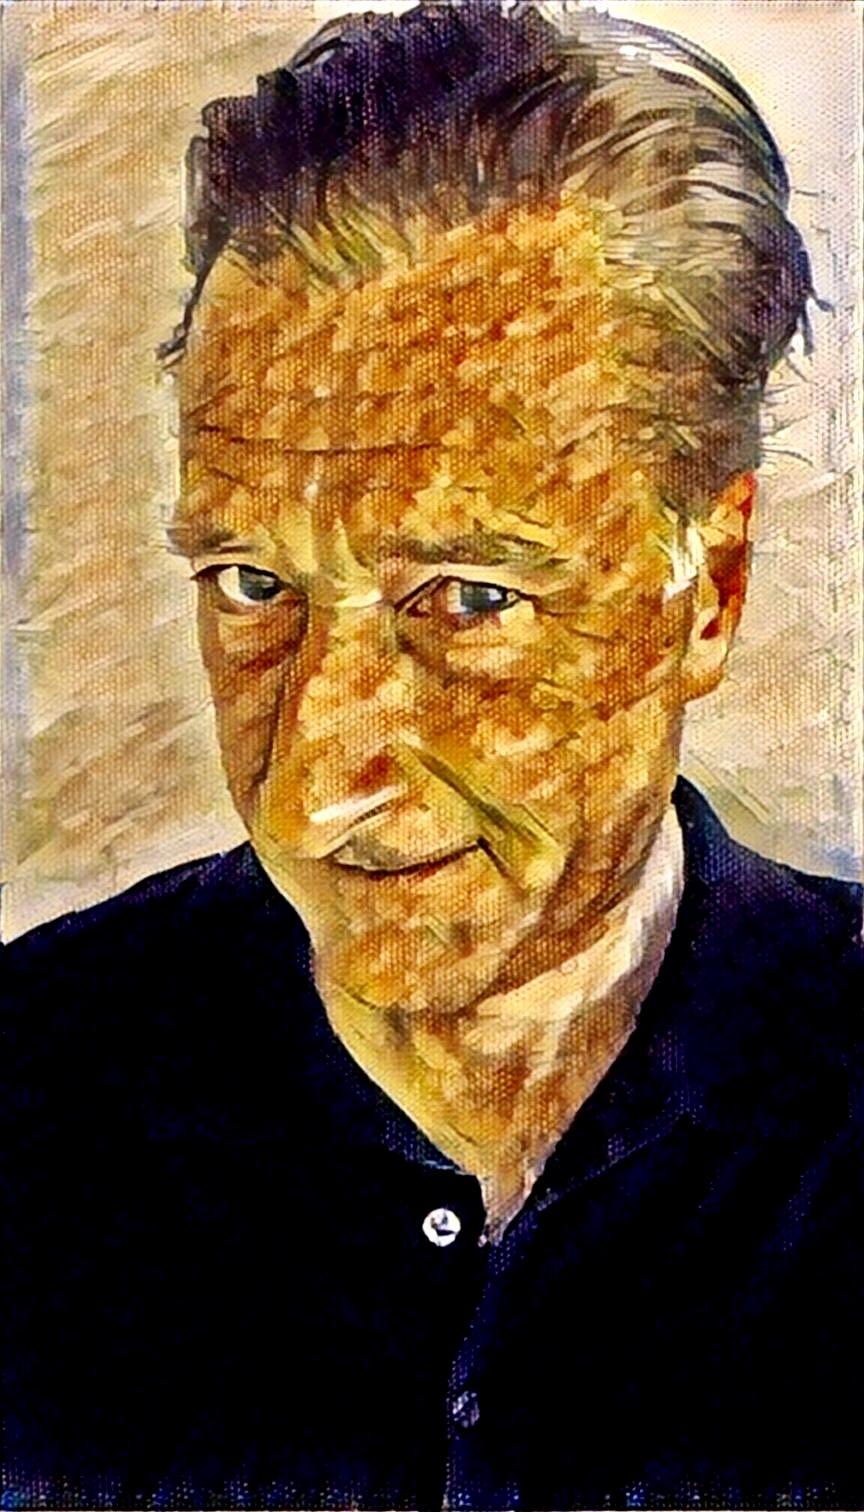 colin goedecke, poet laureate at large